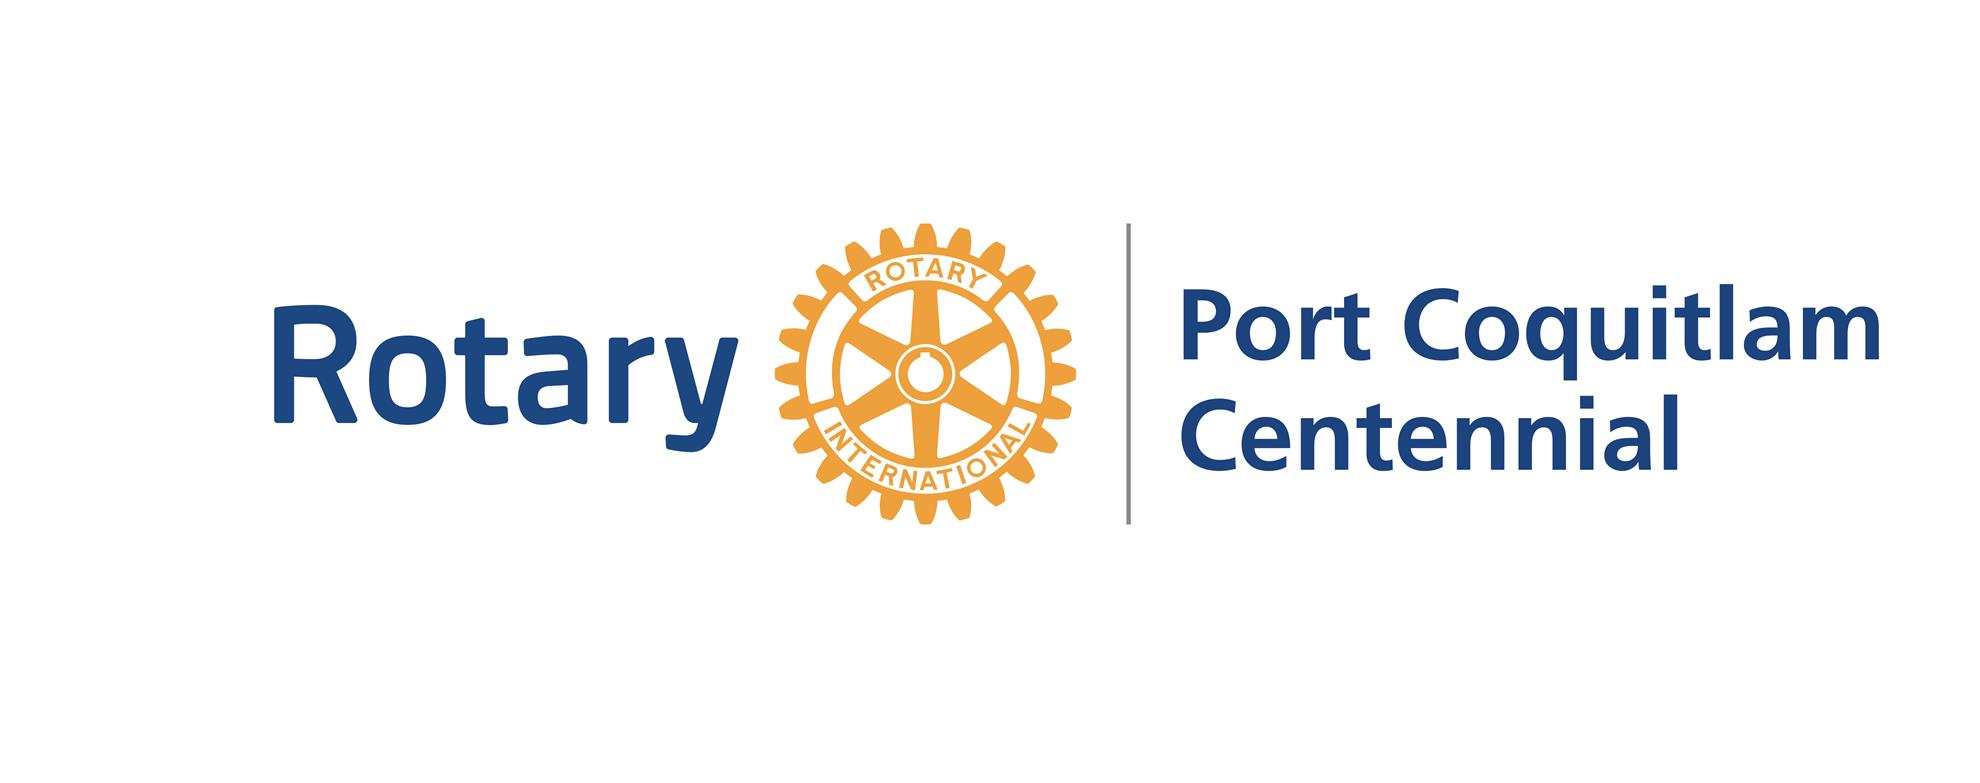 Port Coquitlam Centennial logo